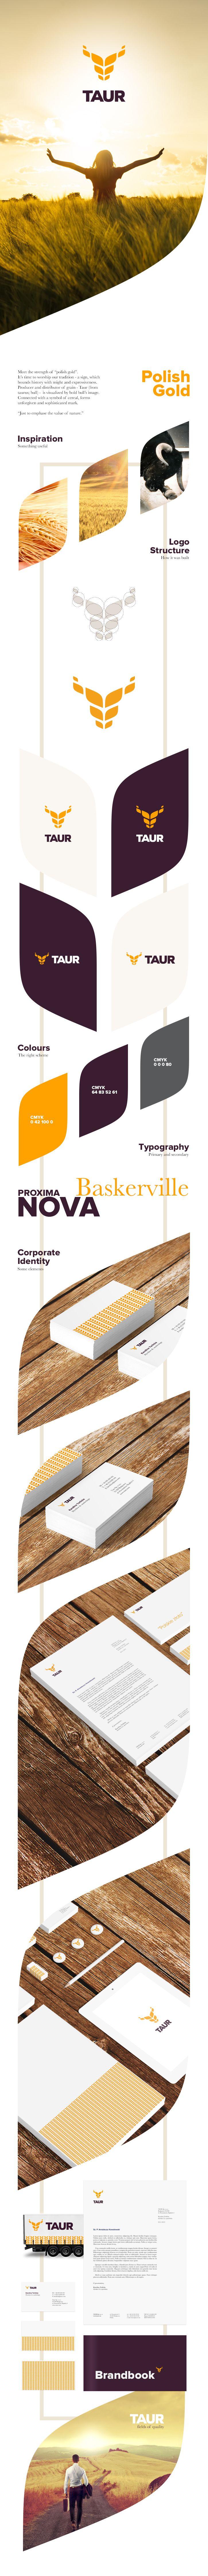 Beprez   #stationary #corporate #design #corporatedesign